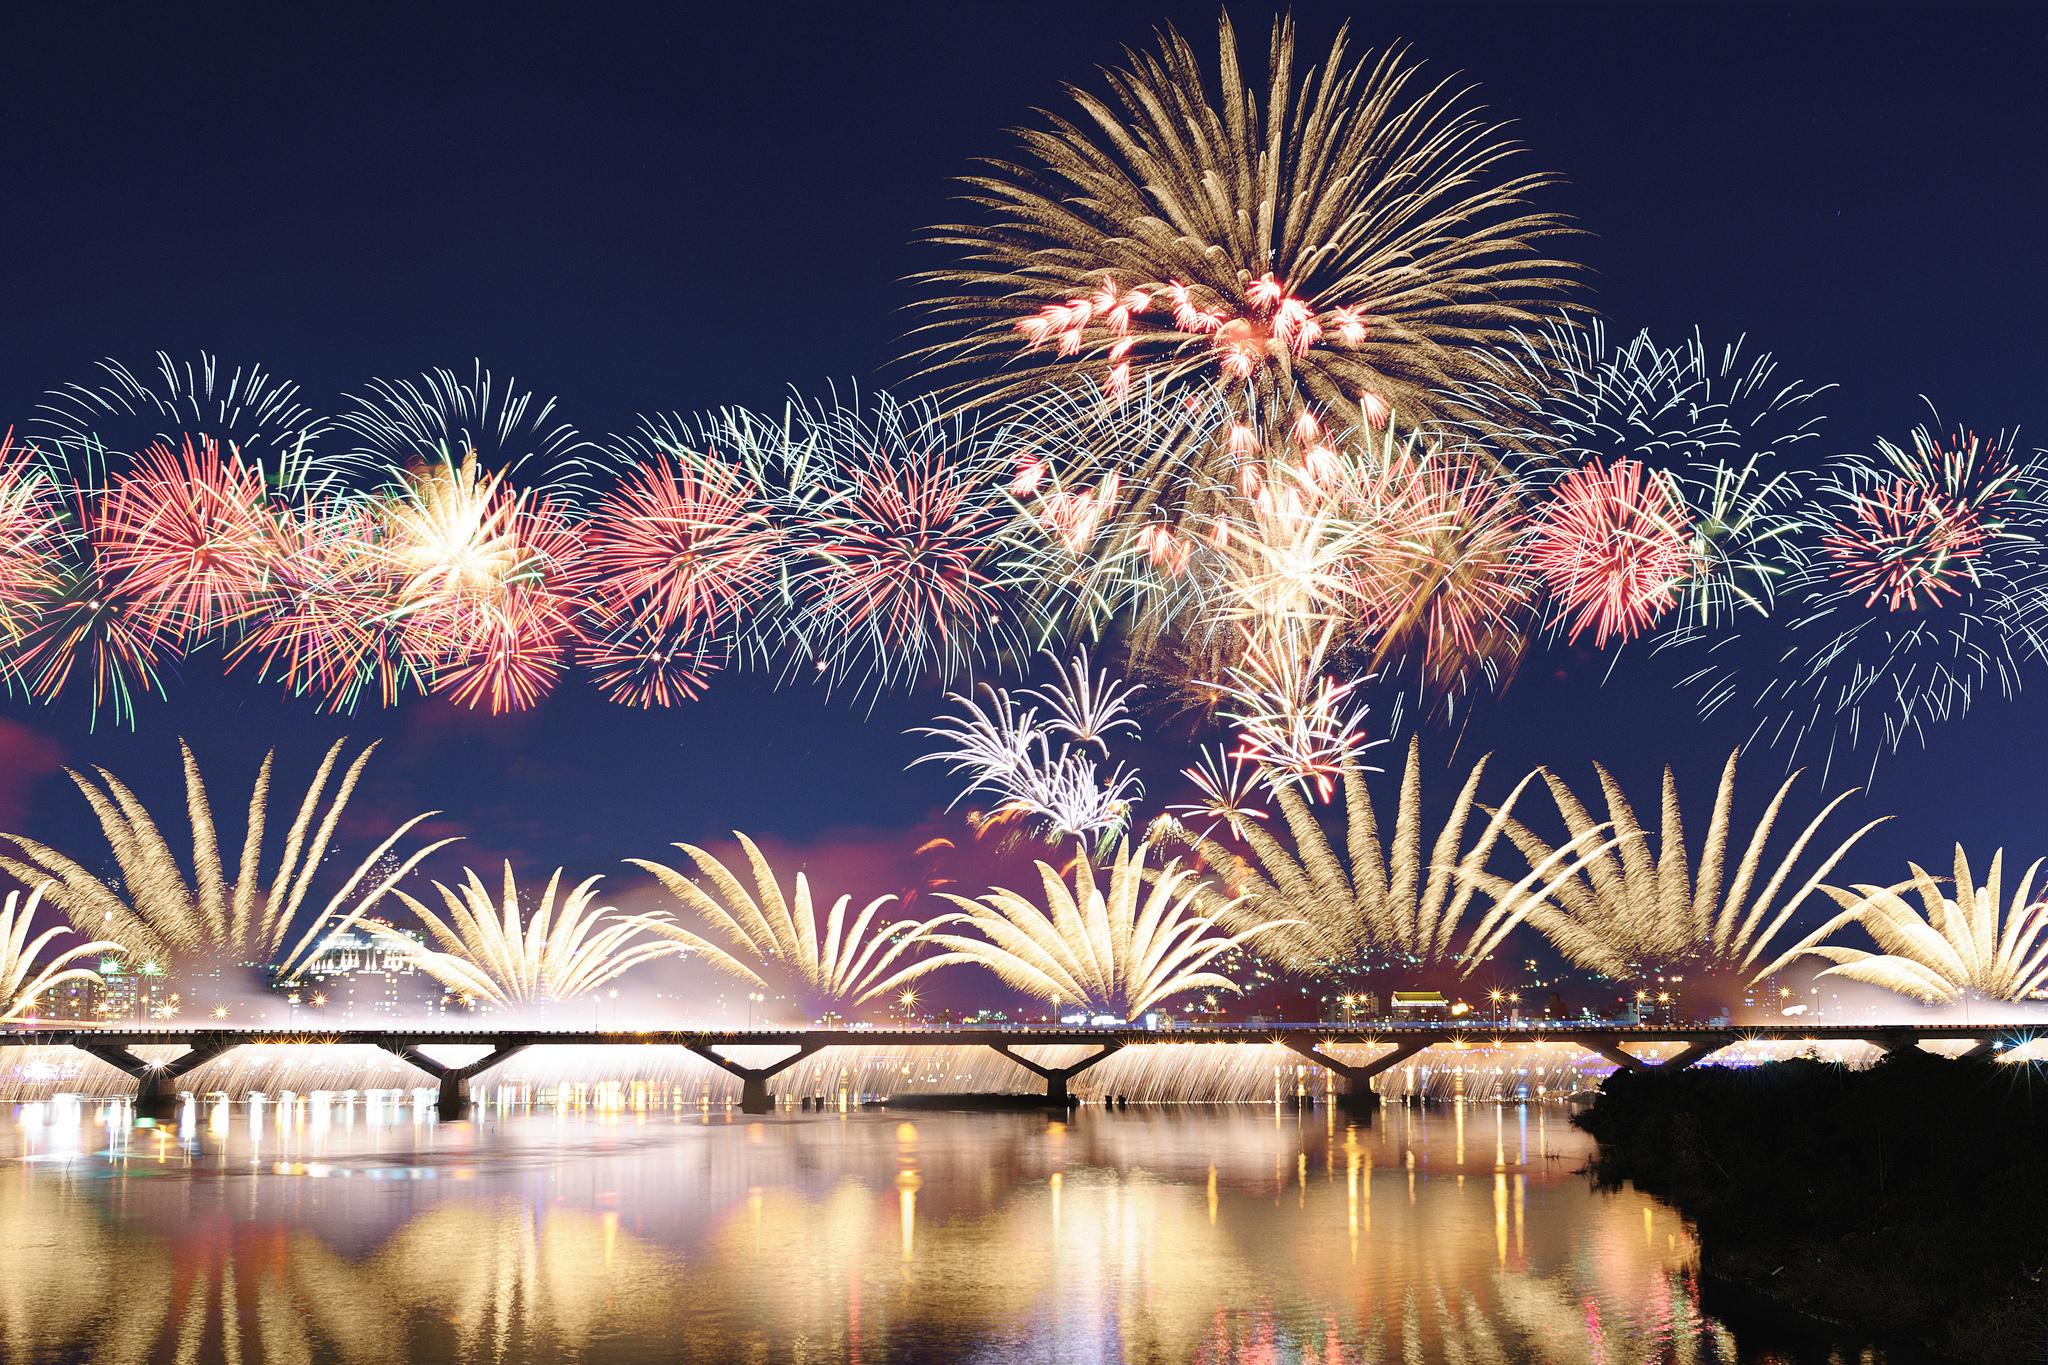 Fireworks Computer Wallpapers Desktop Backgrounds 2048x1365 ID 2048x1365